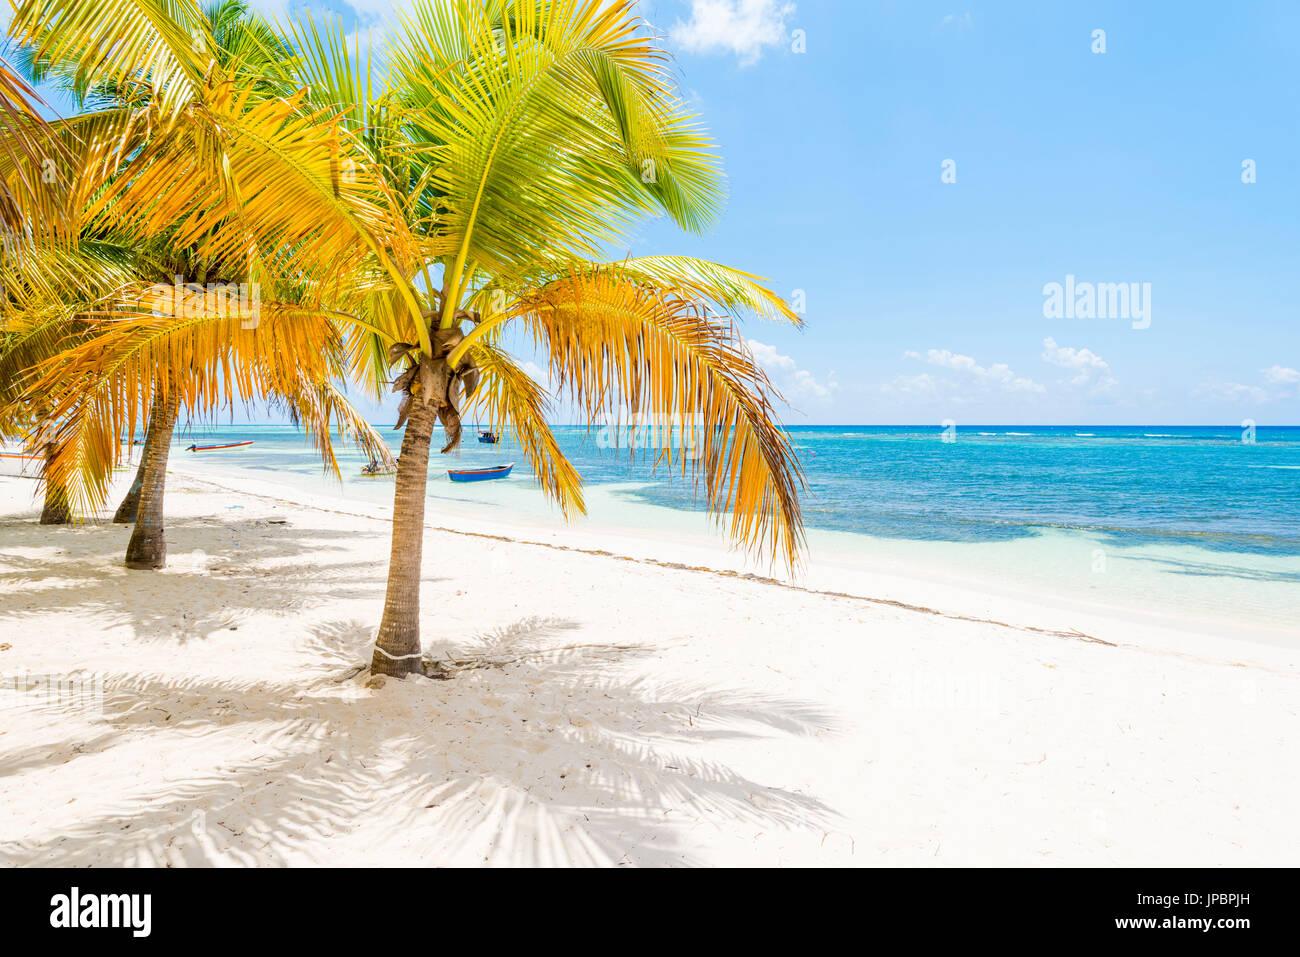 Mano Juan, Isla Saona, East National Park (Parque Nacional del Este), en la República Dominicana, Mar Caribe. Imagen De Stock